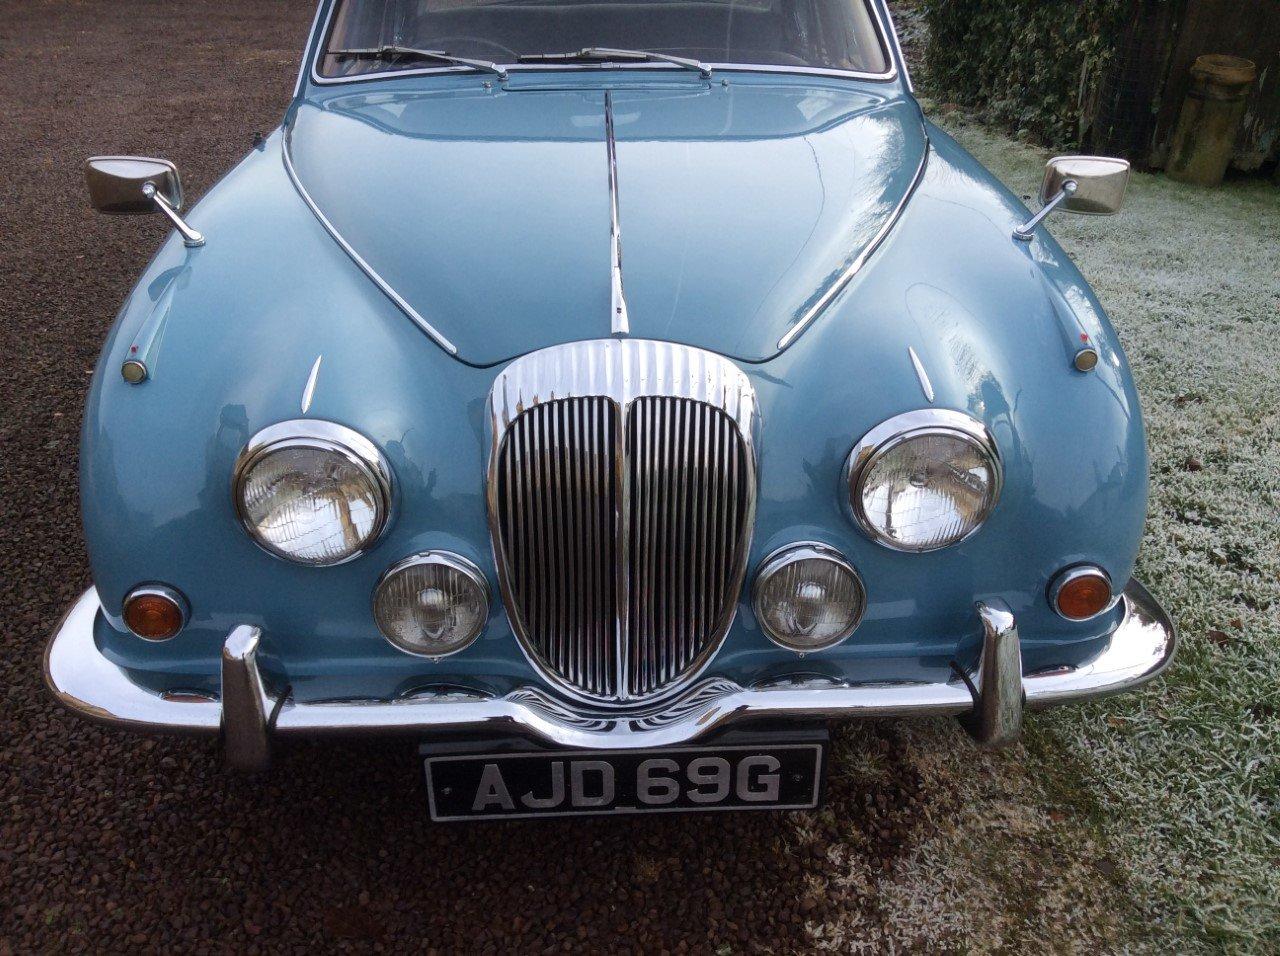 1969 Daimler V8 250  For Sale (picture 4 of 6)